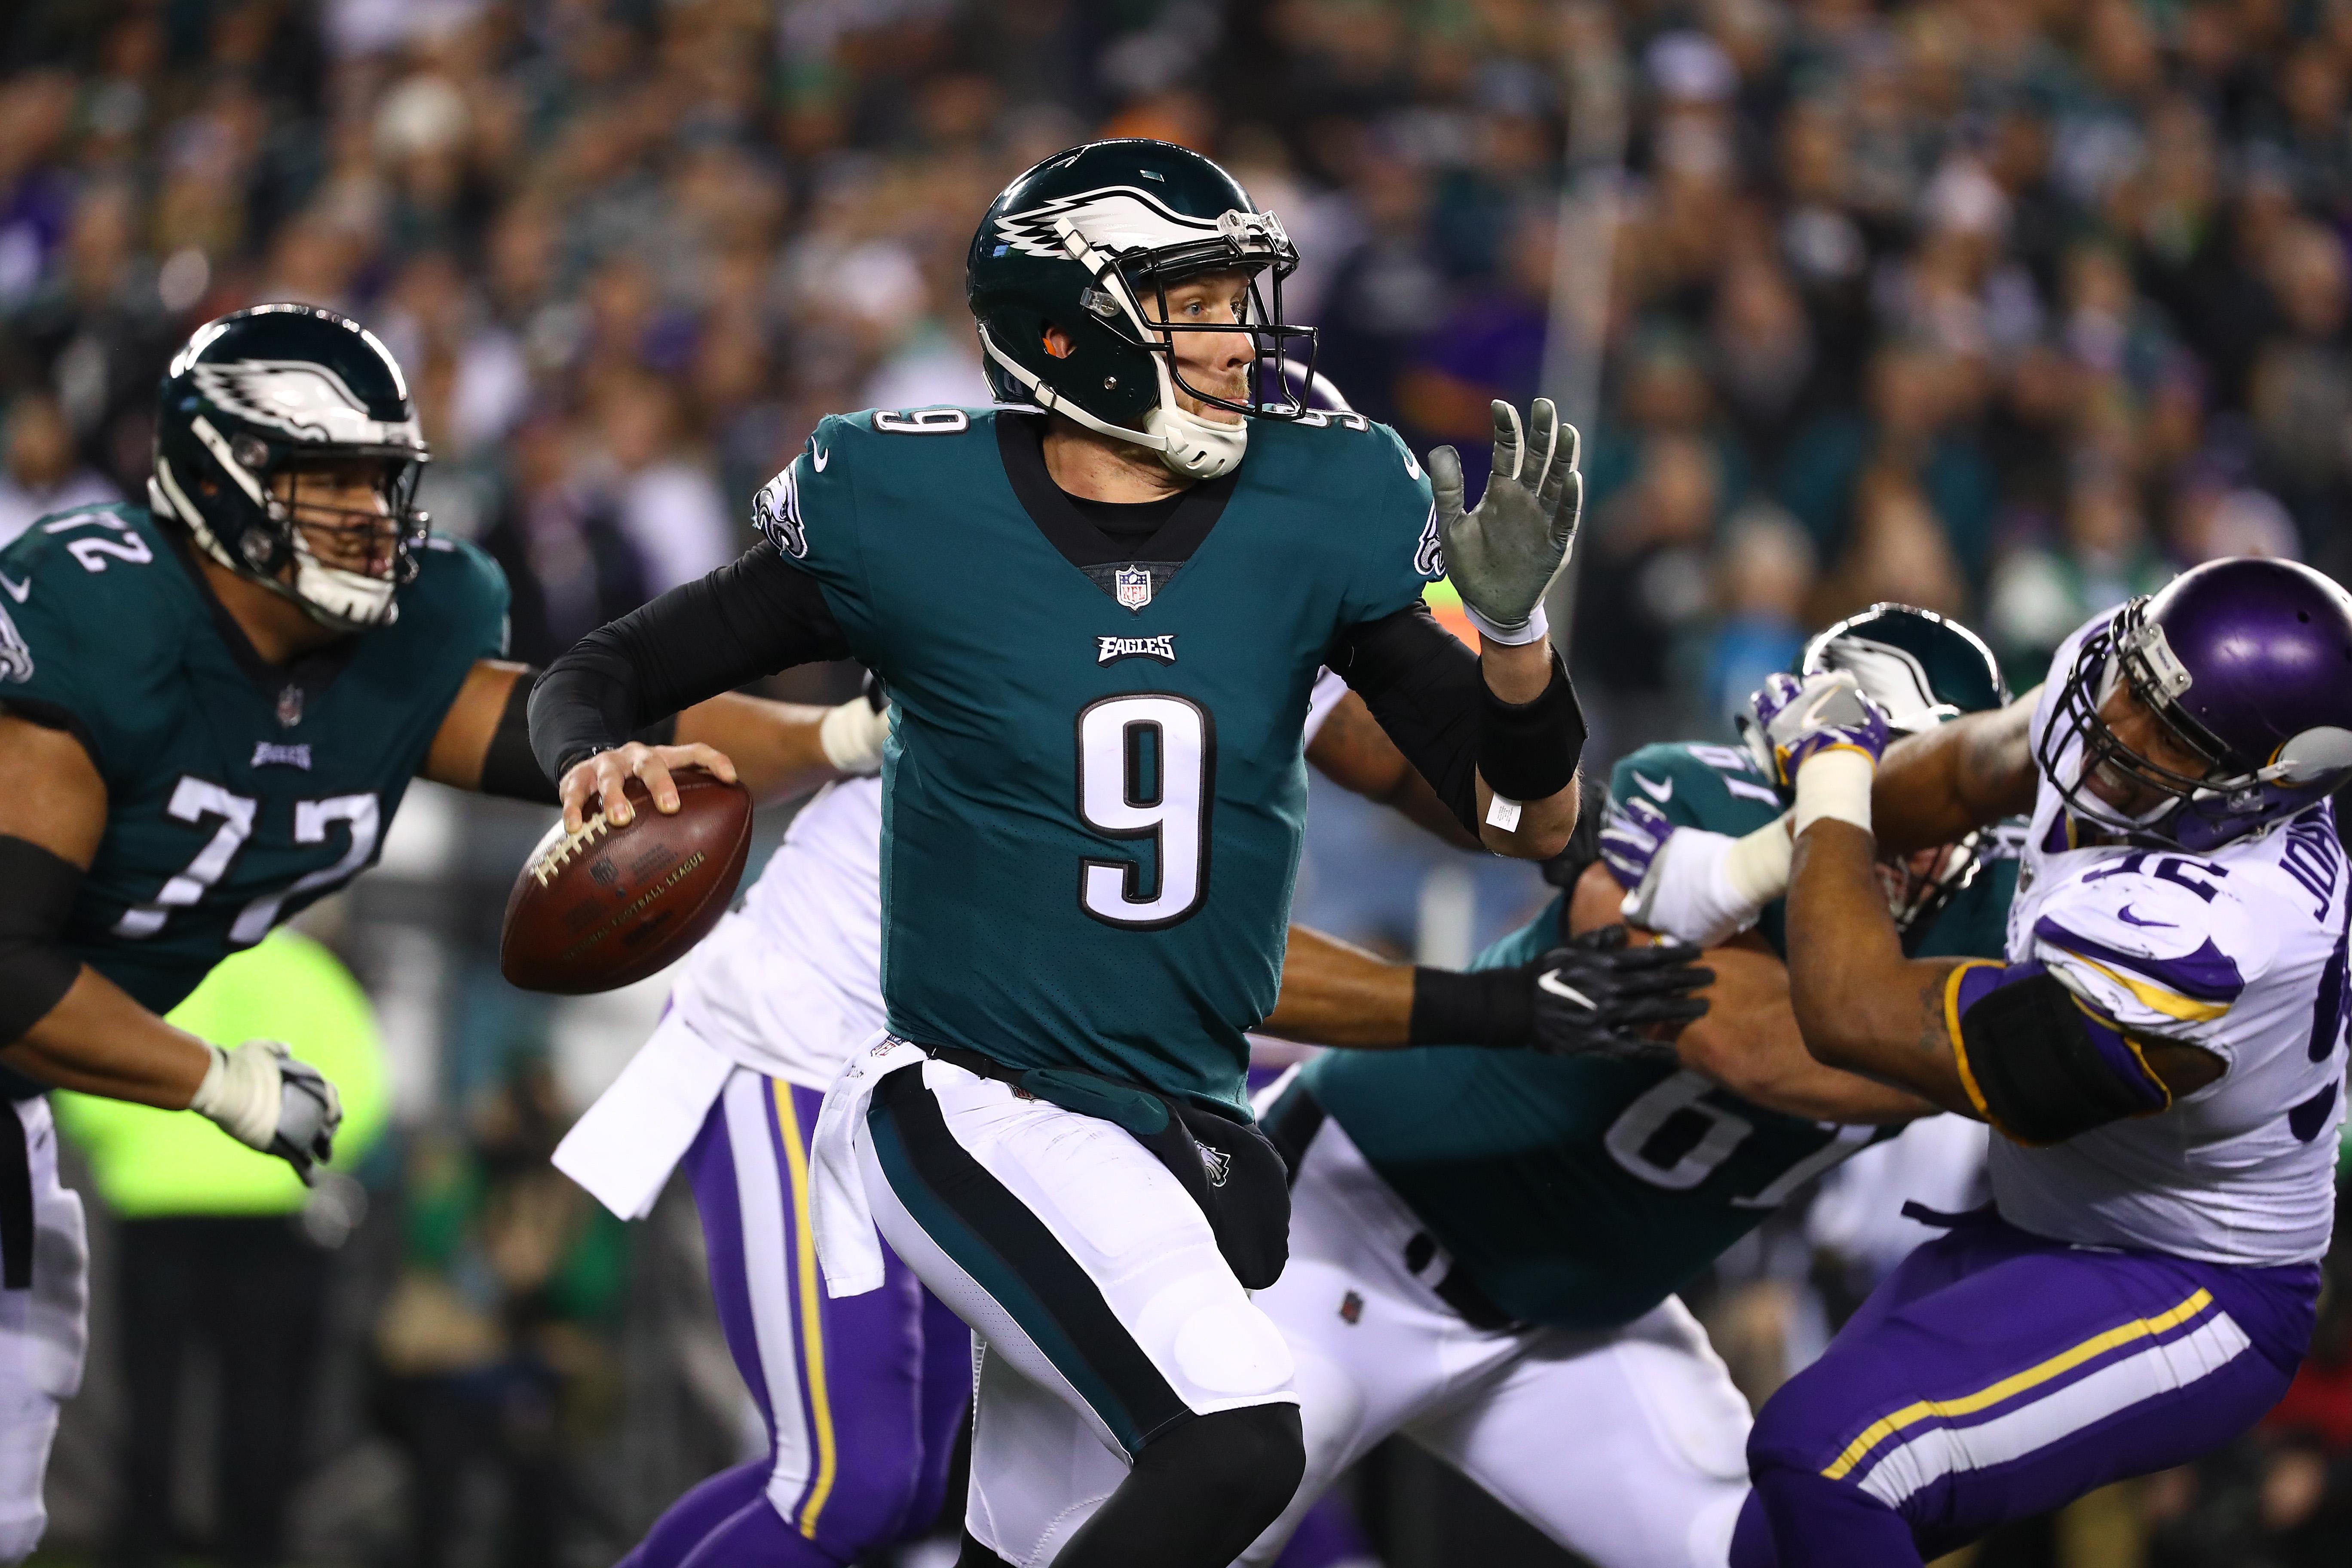 Nick Foles joined the list of backup quarterbacks who've won Super Bowls